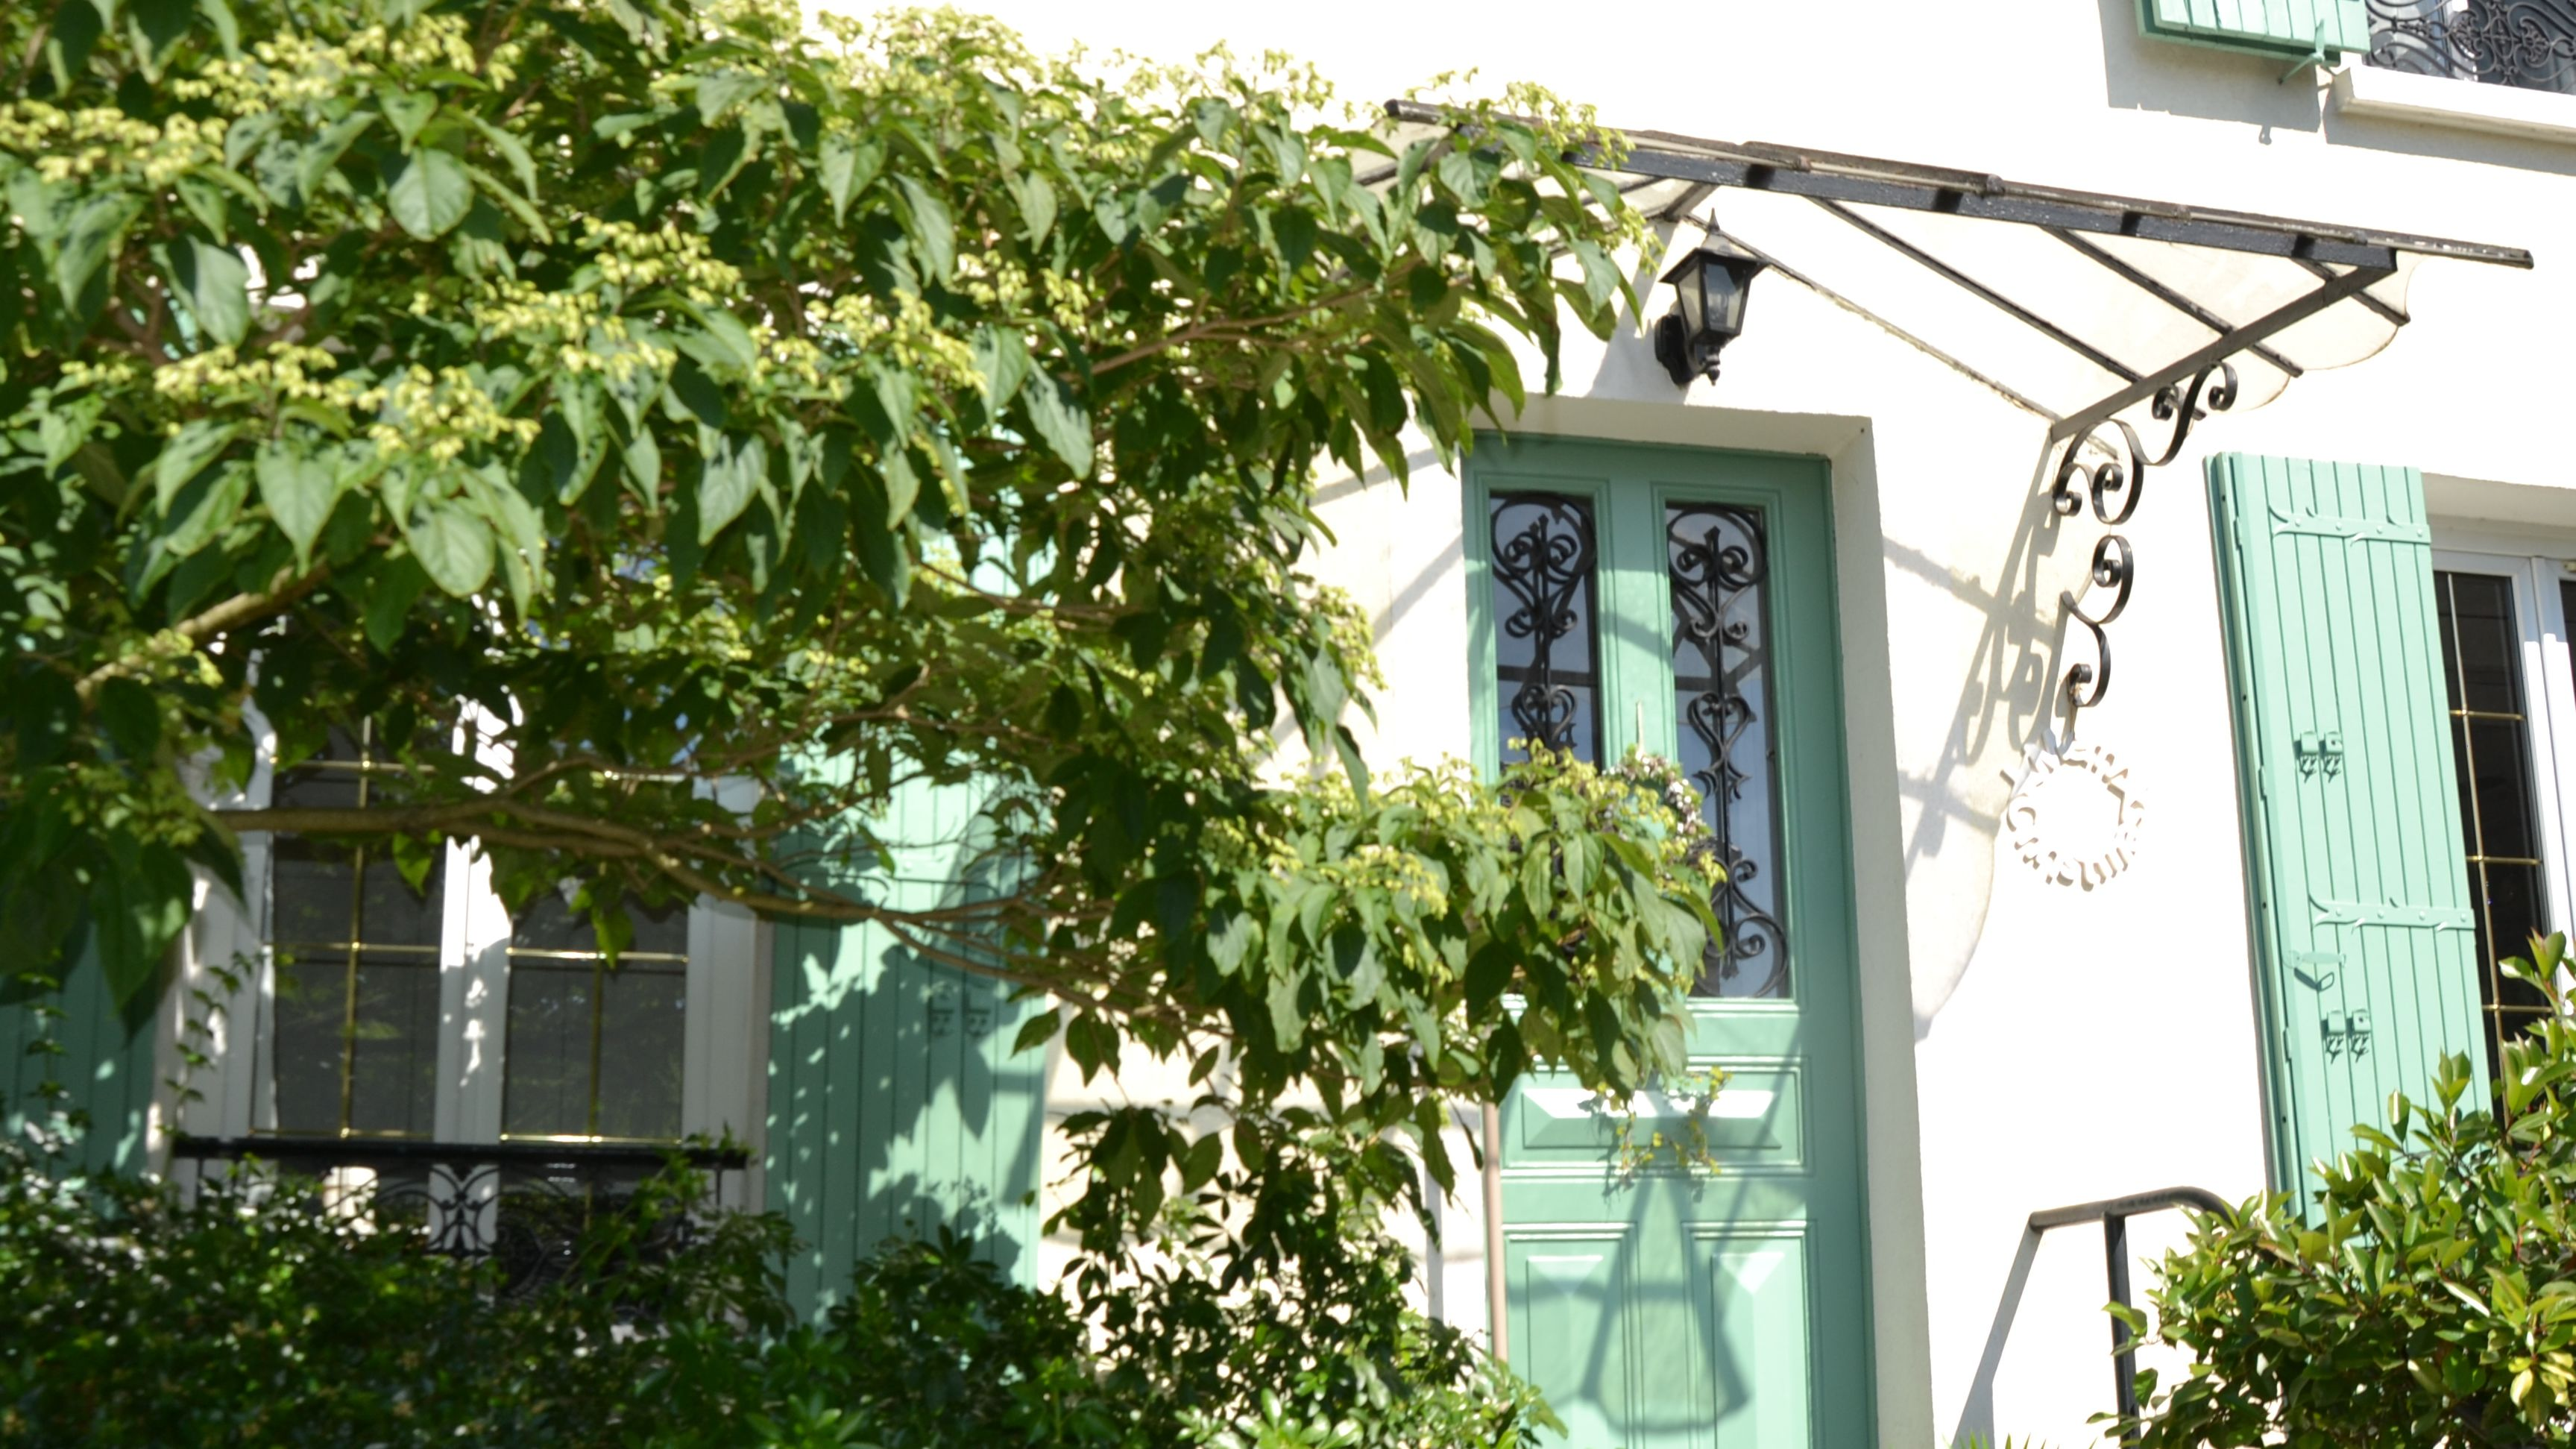 11 rue Jean Mermoz